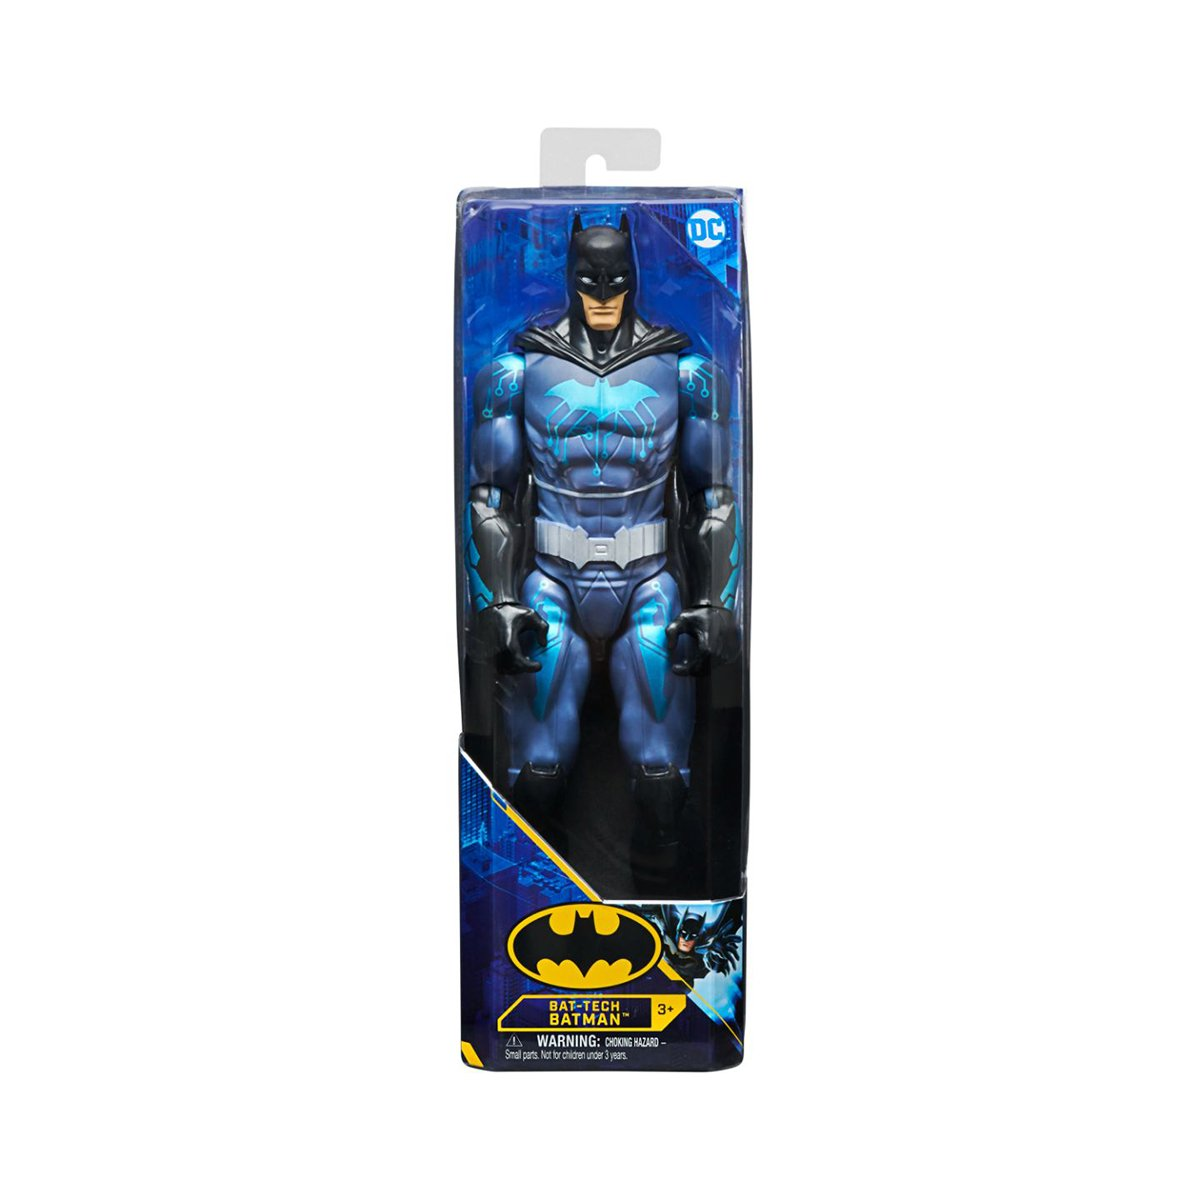 Figurina articulata, Batman, Bluecirc S1